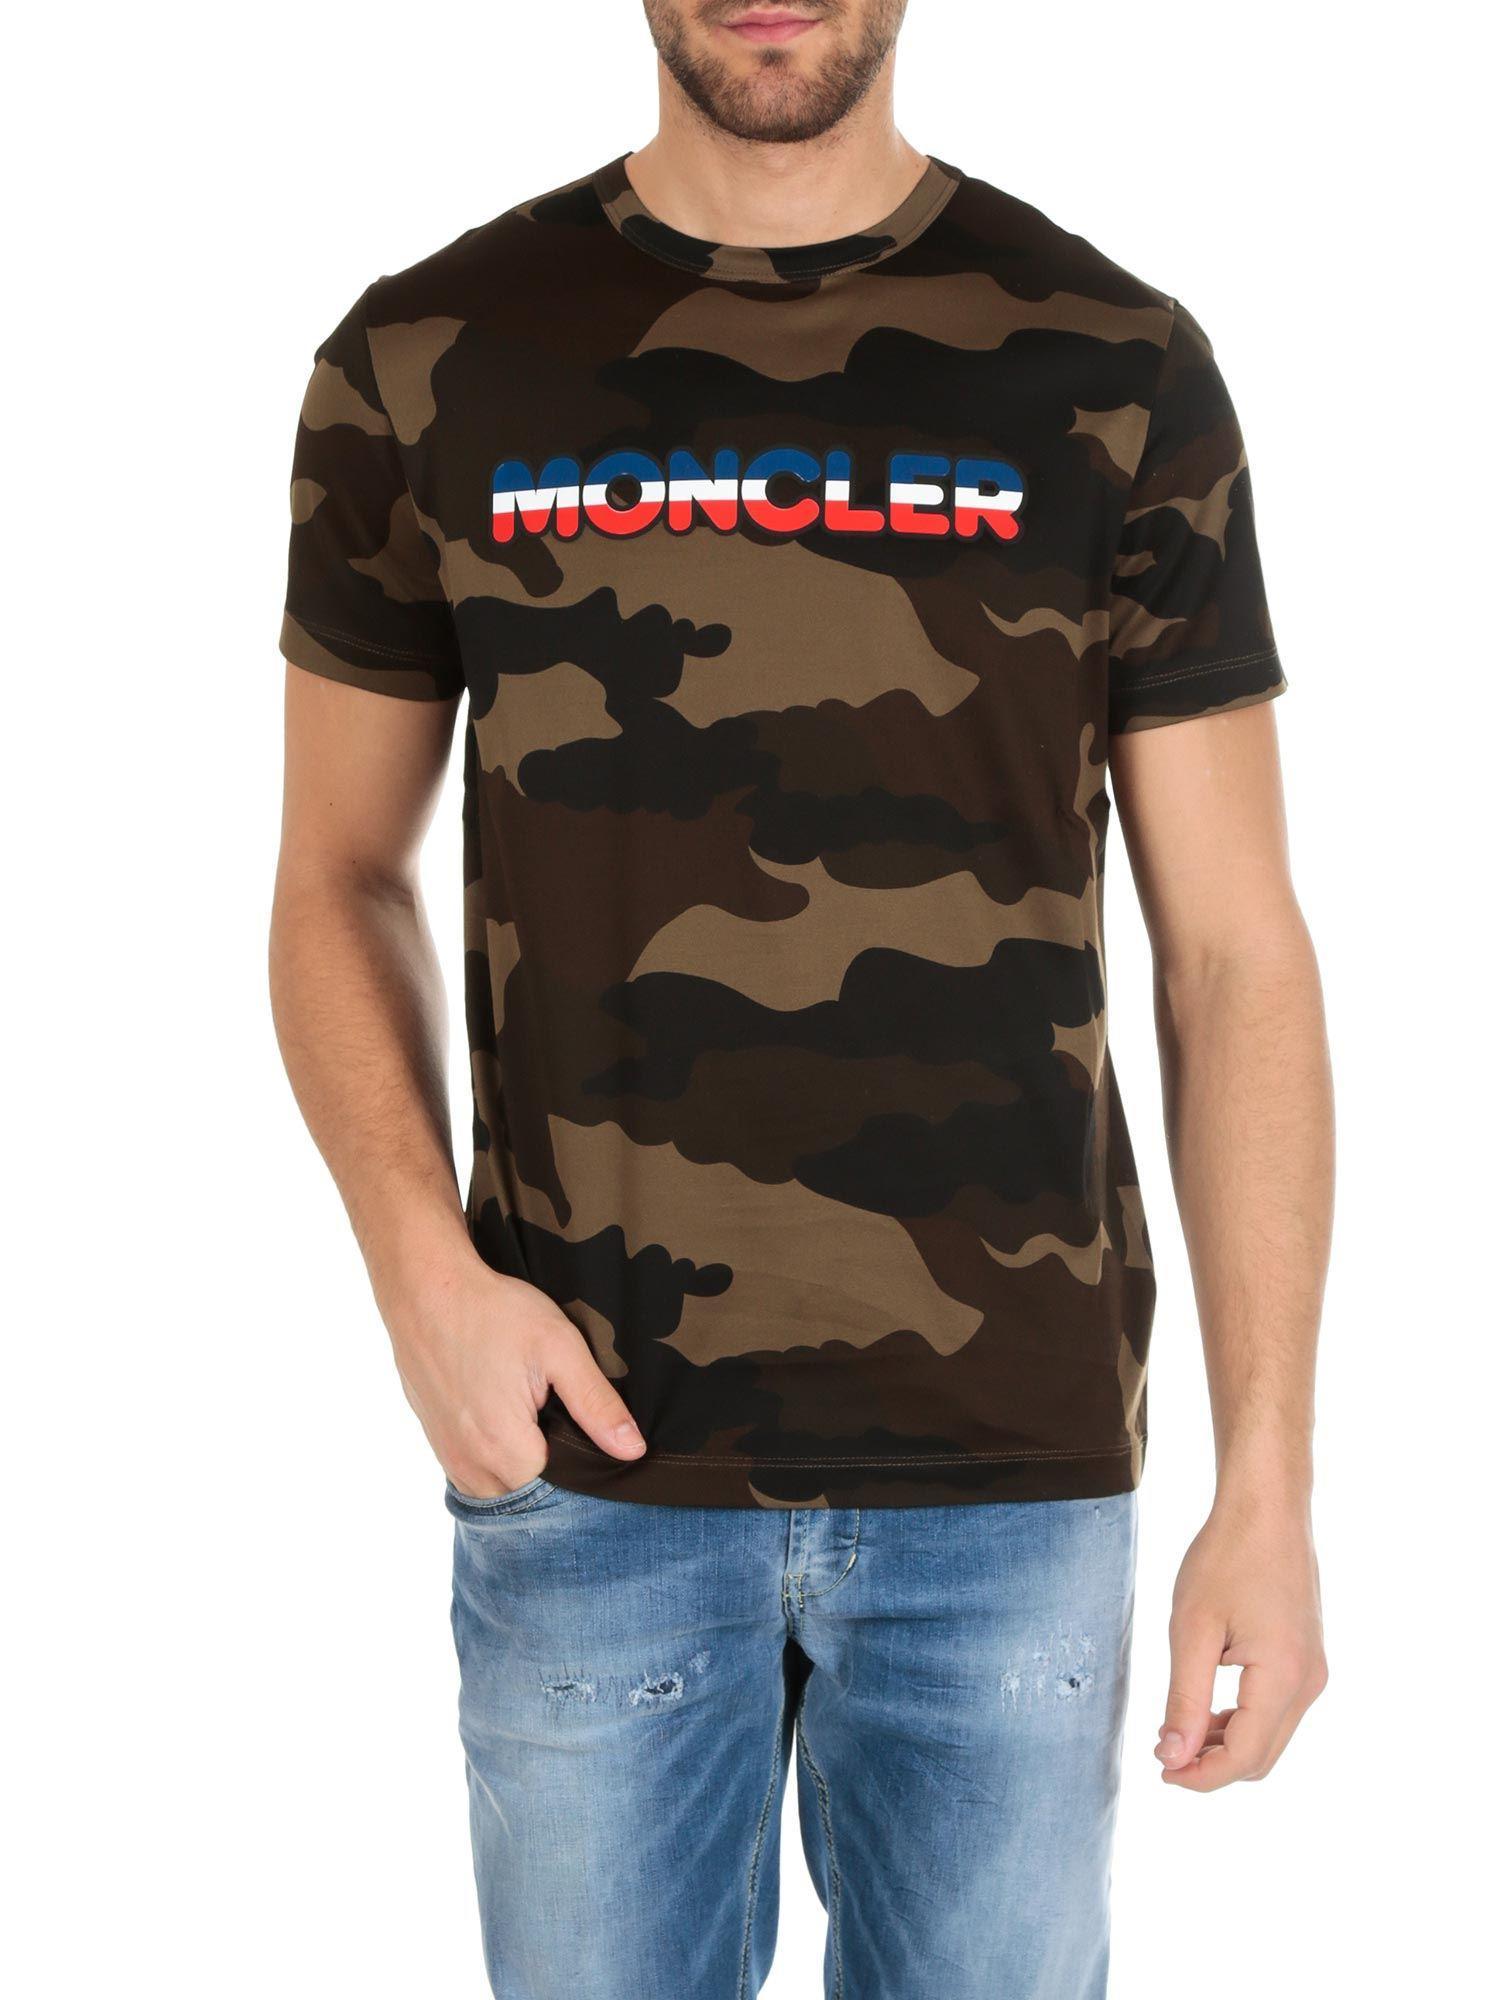 4456459b4 Moncler - Black Camouflage T-shirt for Men - Lyst. View fullscreen